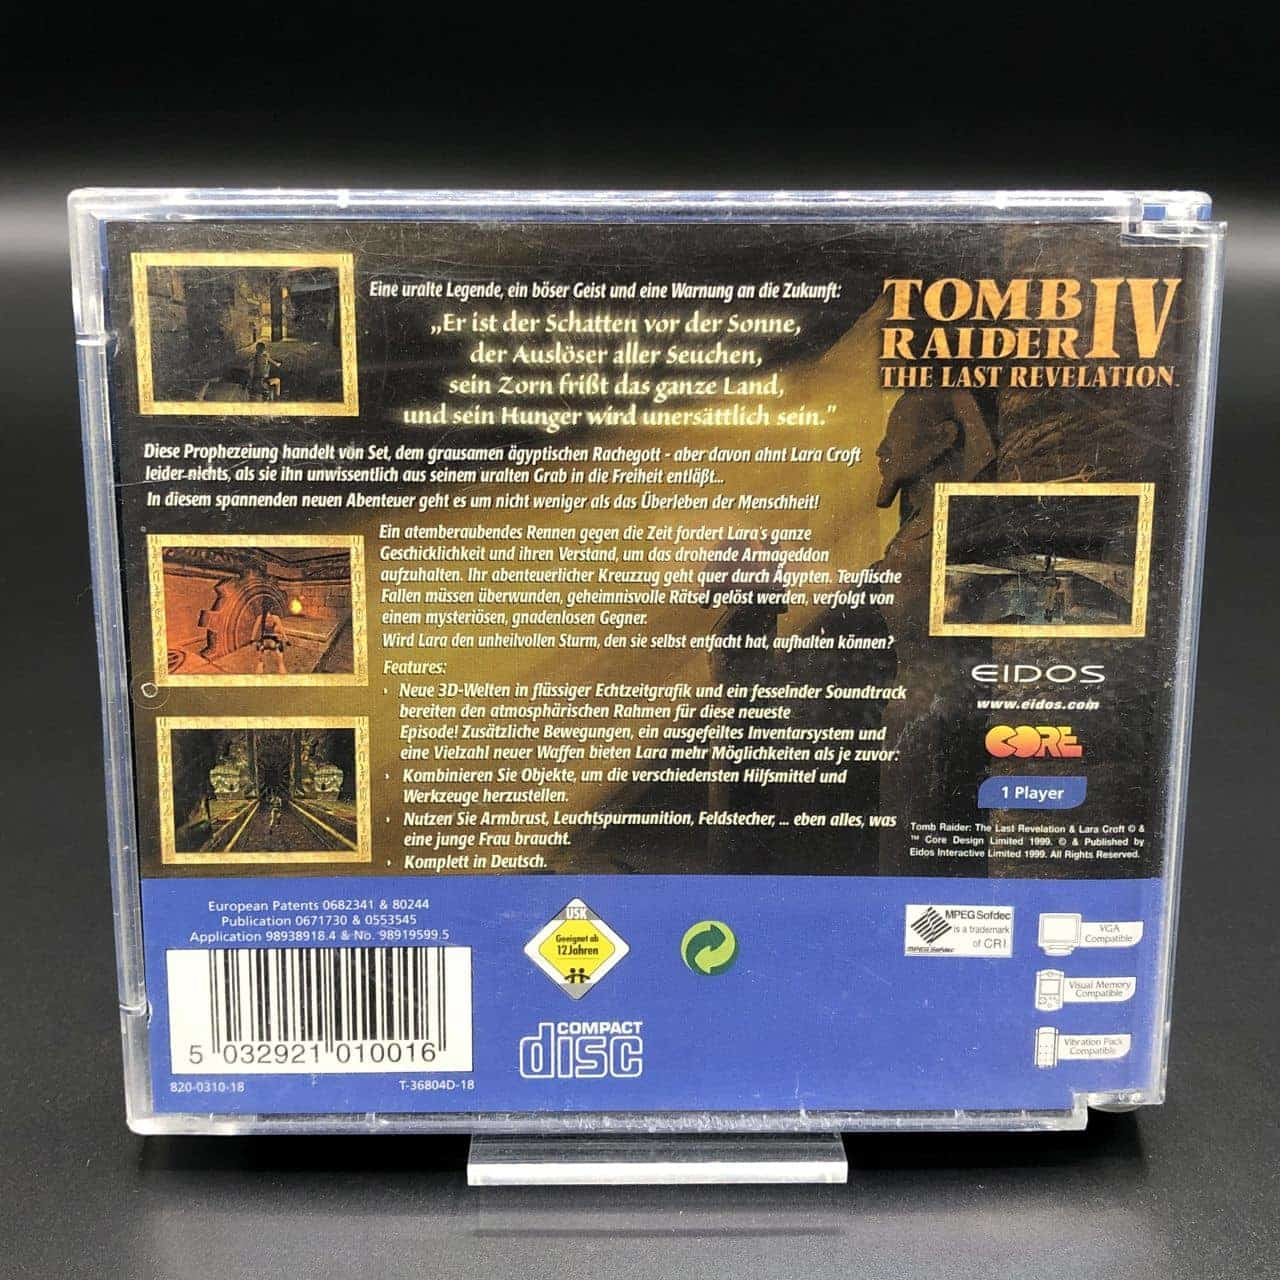 Tomb Raider IV: The Last Revelation (Komplett) (Gebrauchsspuren) Sega Dreamcast